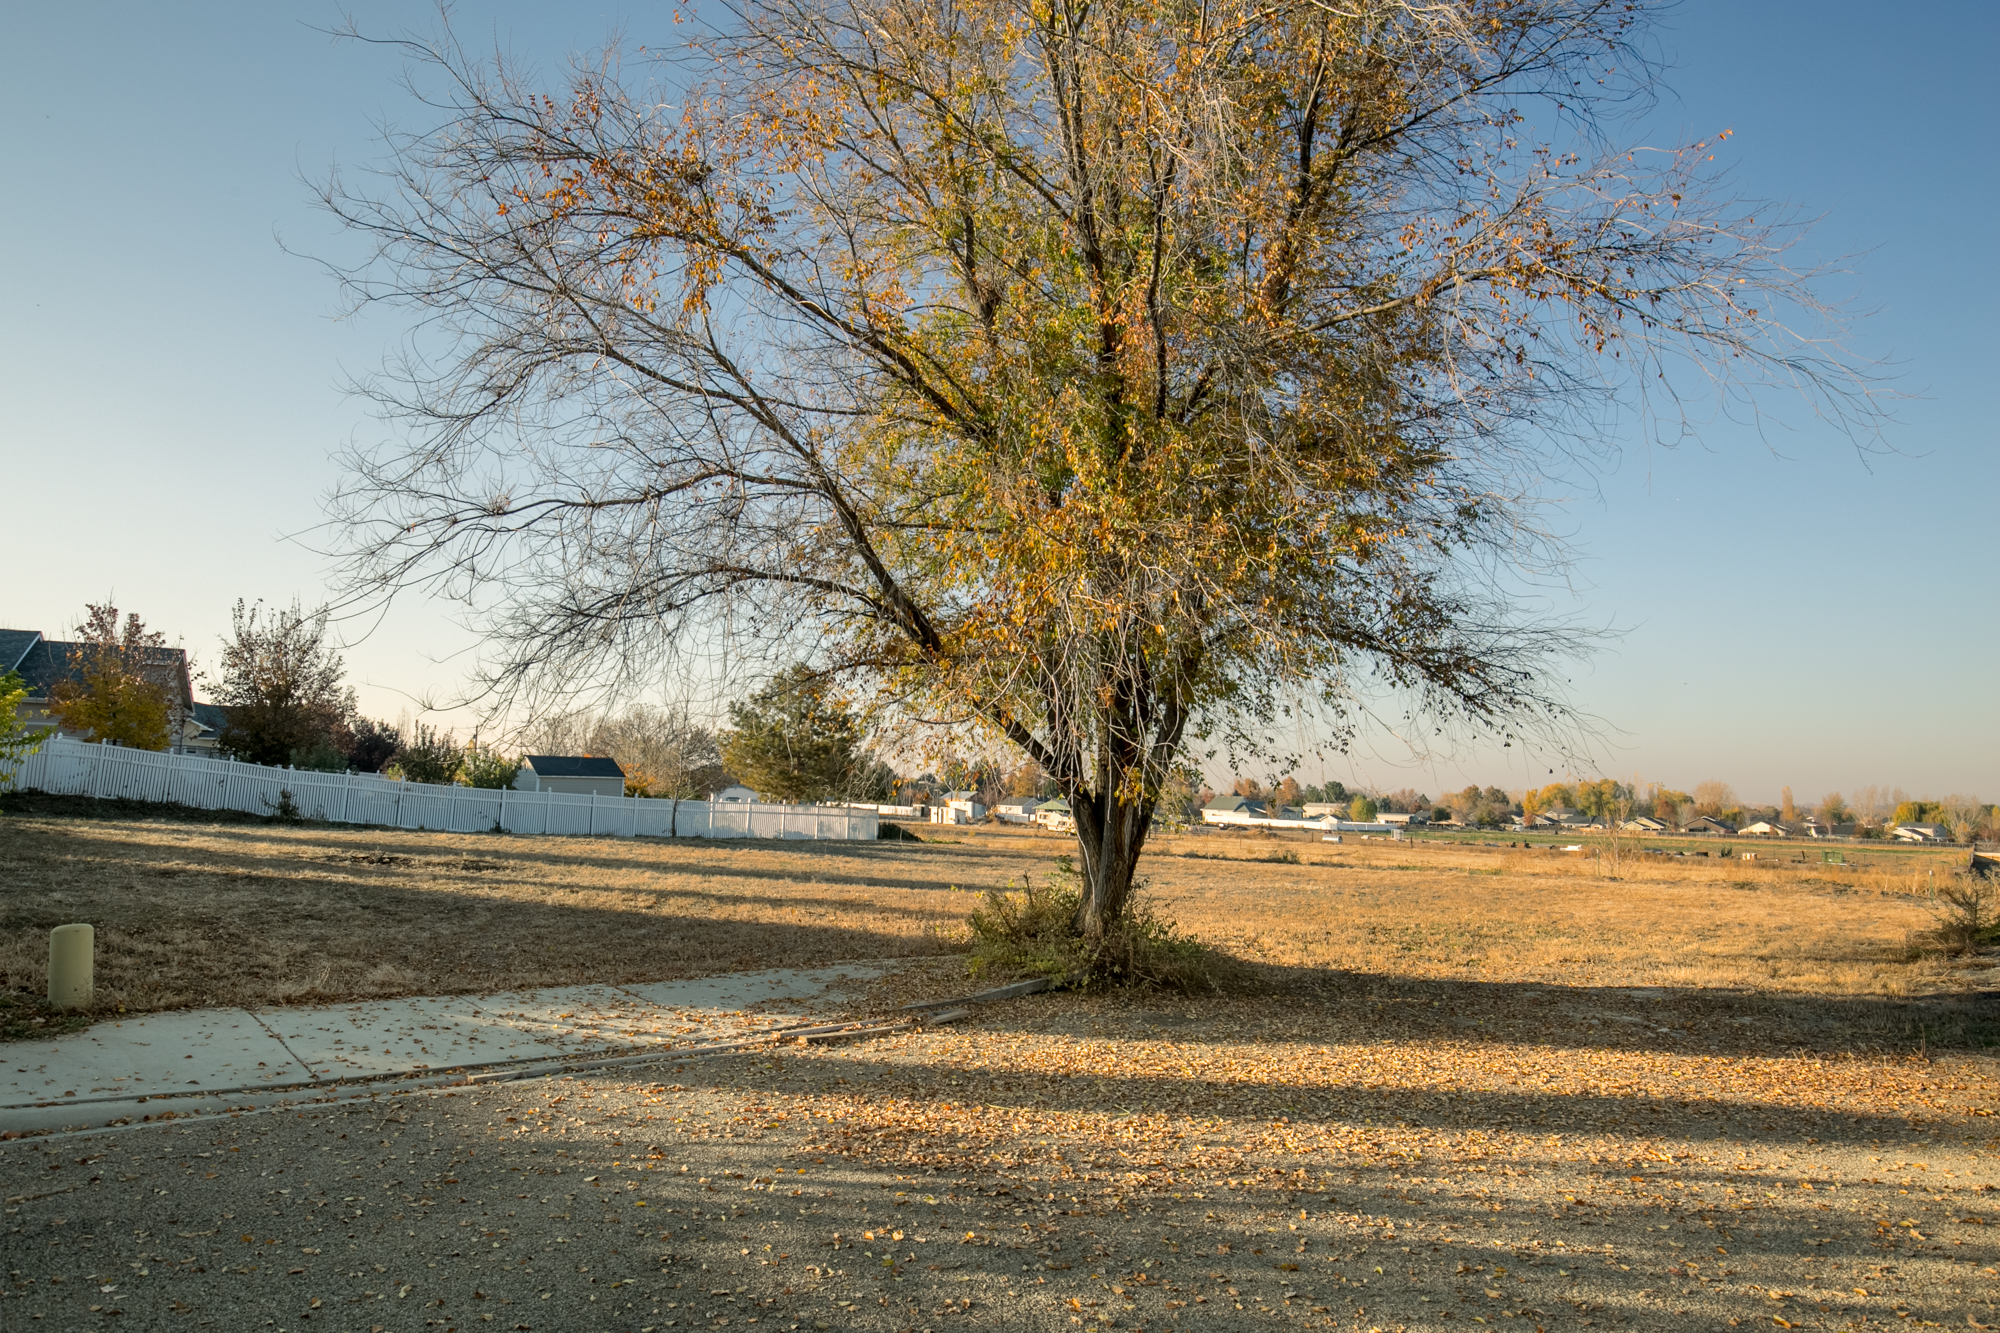 Земля для того Продажа на TBD Marshall Avenue, Caldwell Caldwell, Айдахо, 83605 Соединенные Штаты